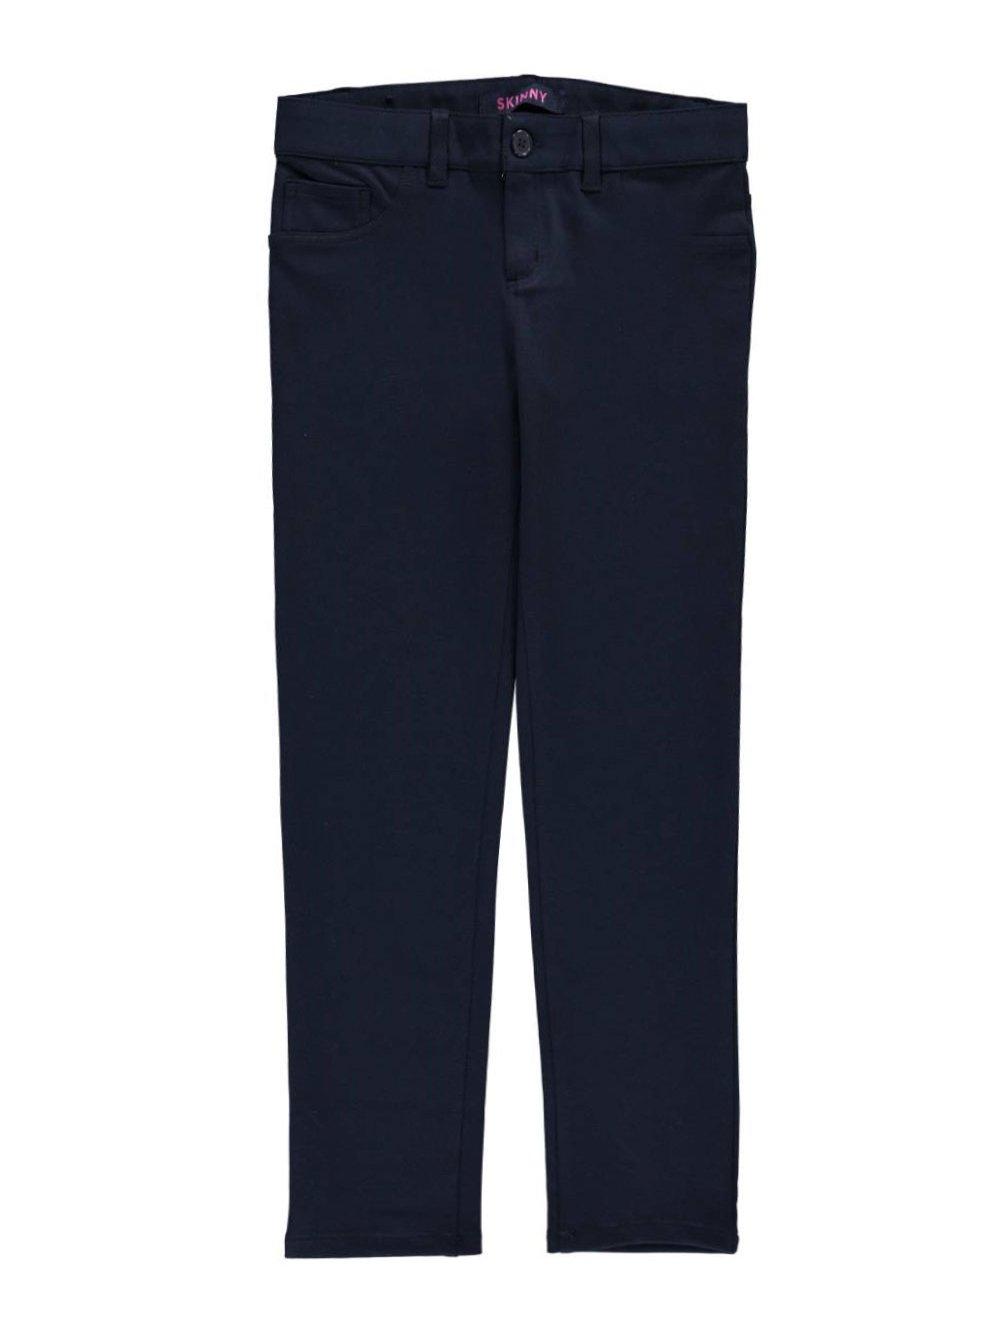 French Toast Girls Plus Size' Stretch Skinny 5 Pocket Knit Pant, Navy, 20.5